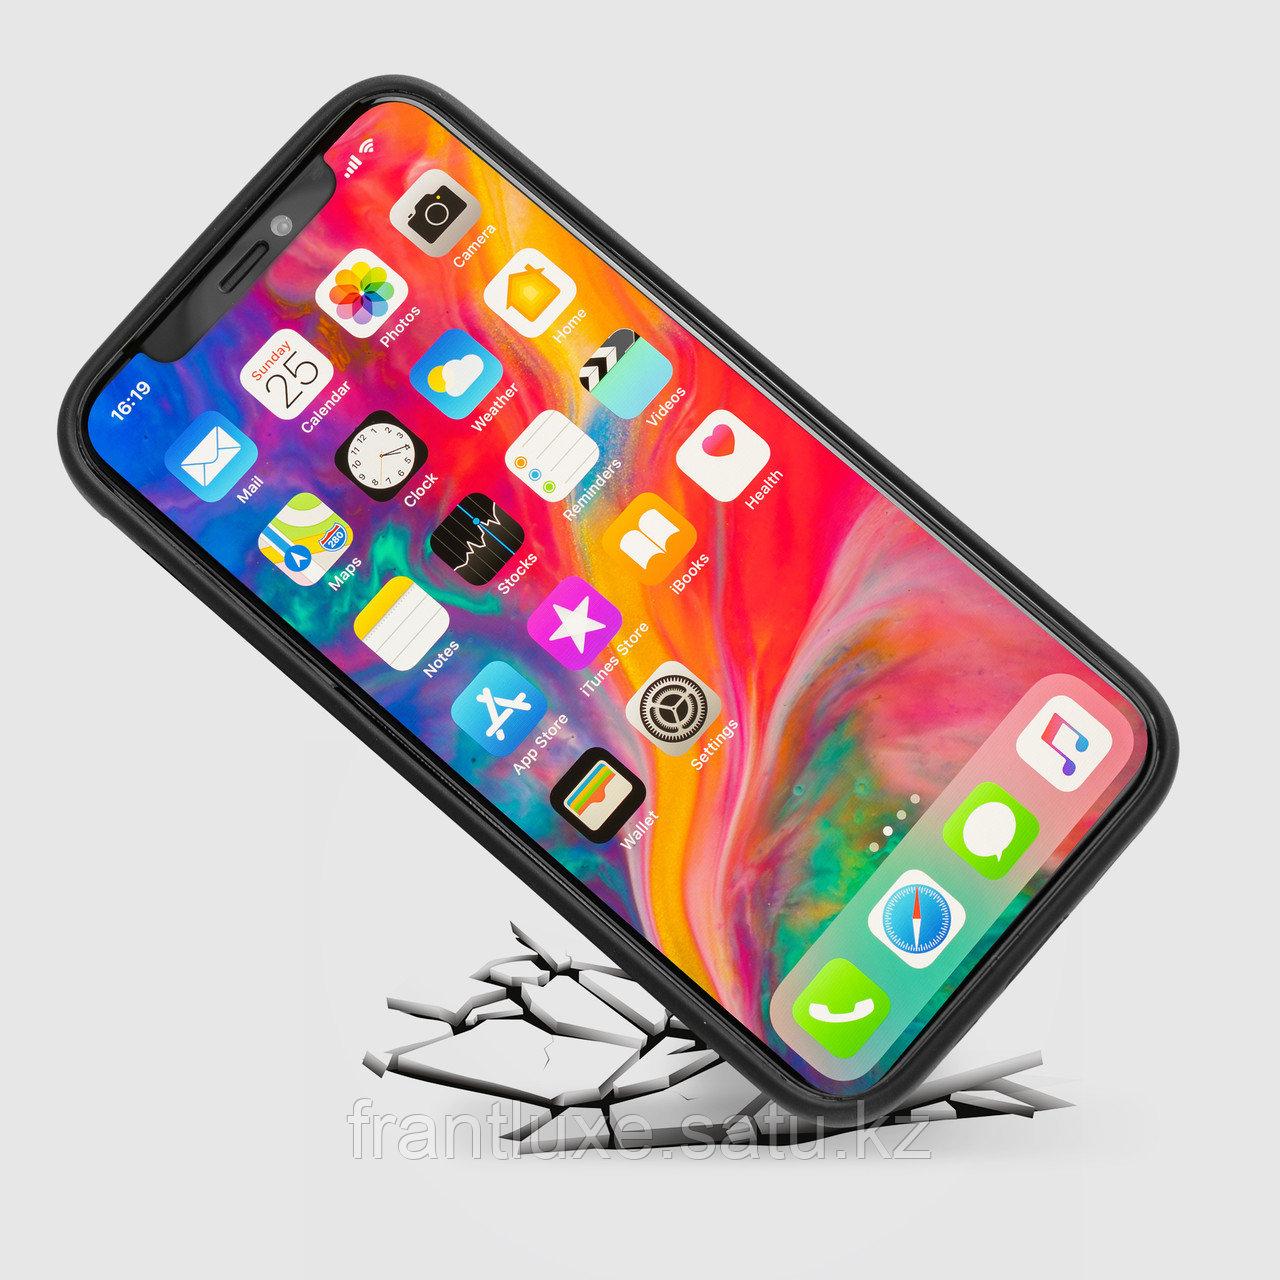 Чехол для телефона iPhone 12 Pro Max синий - фото 5